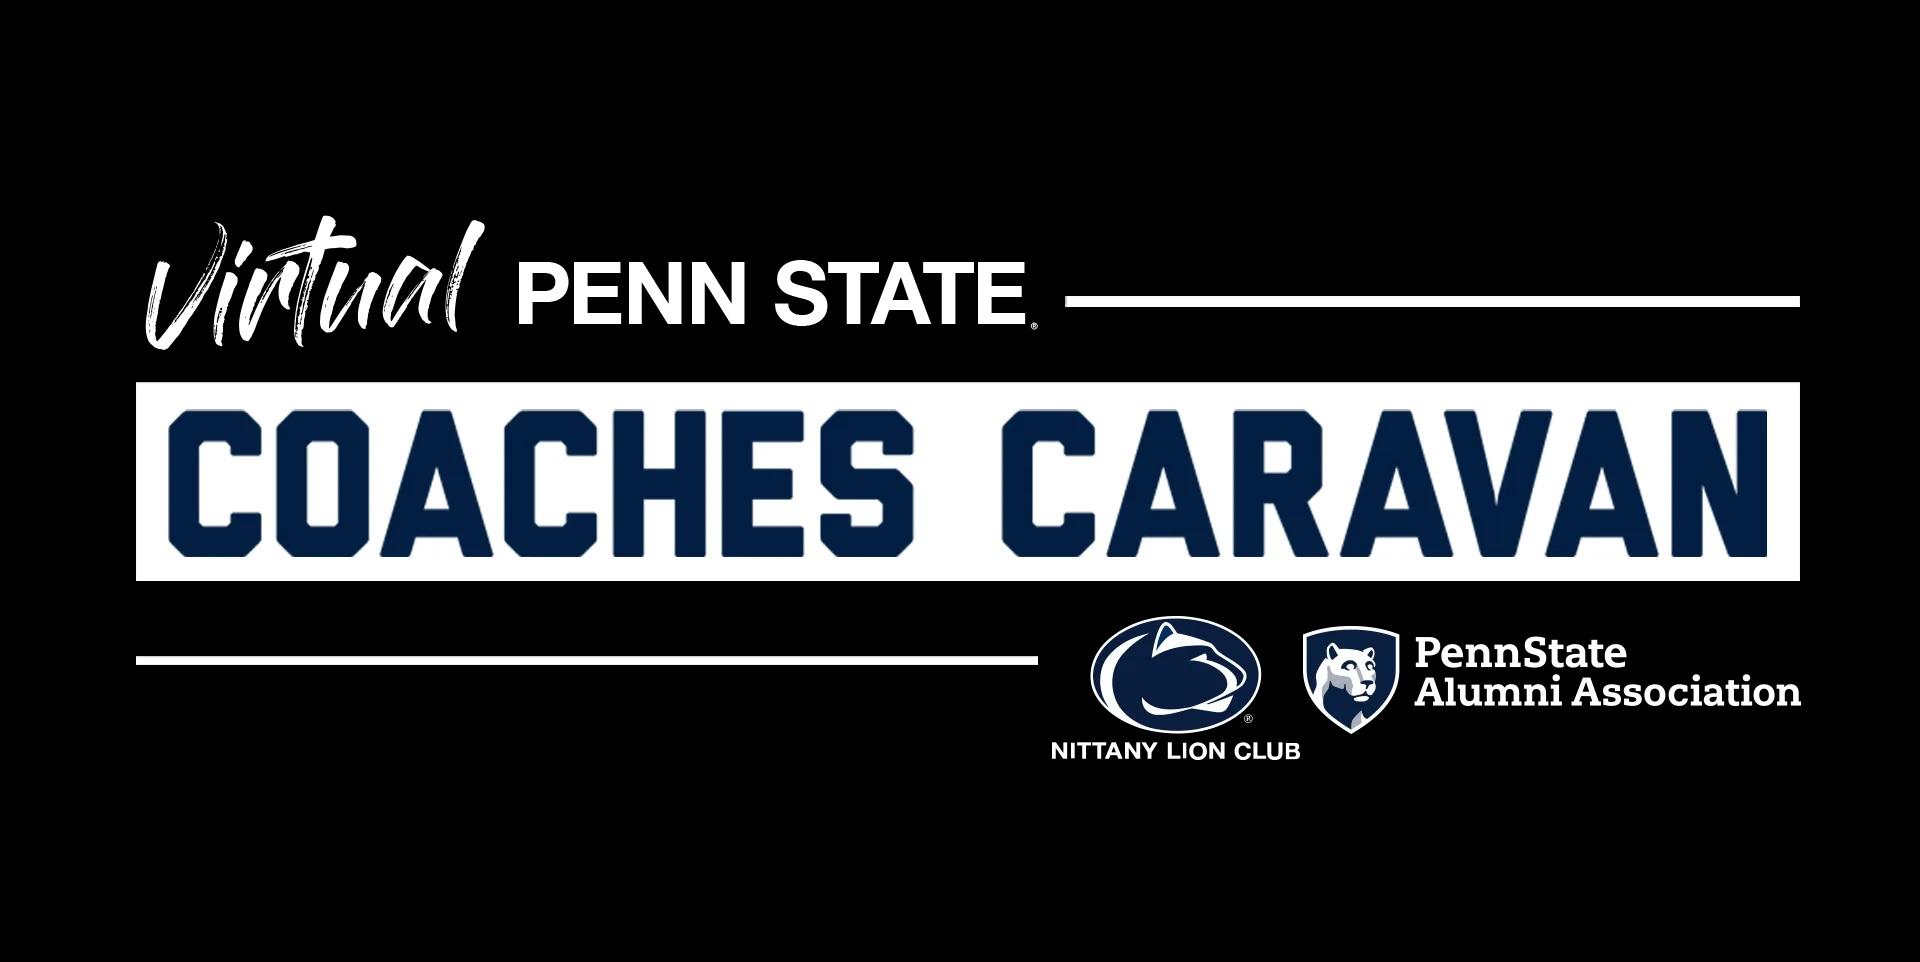 coaches-caravan